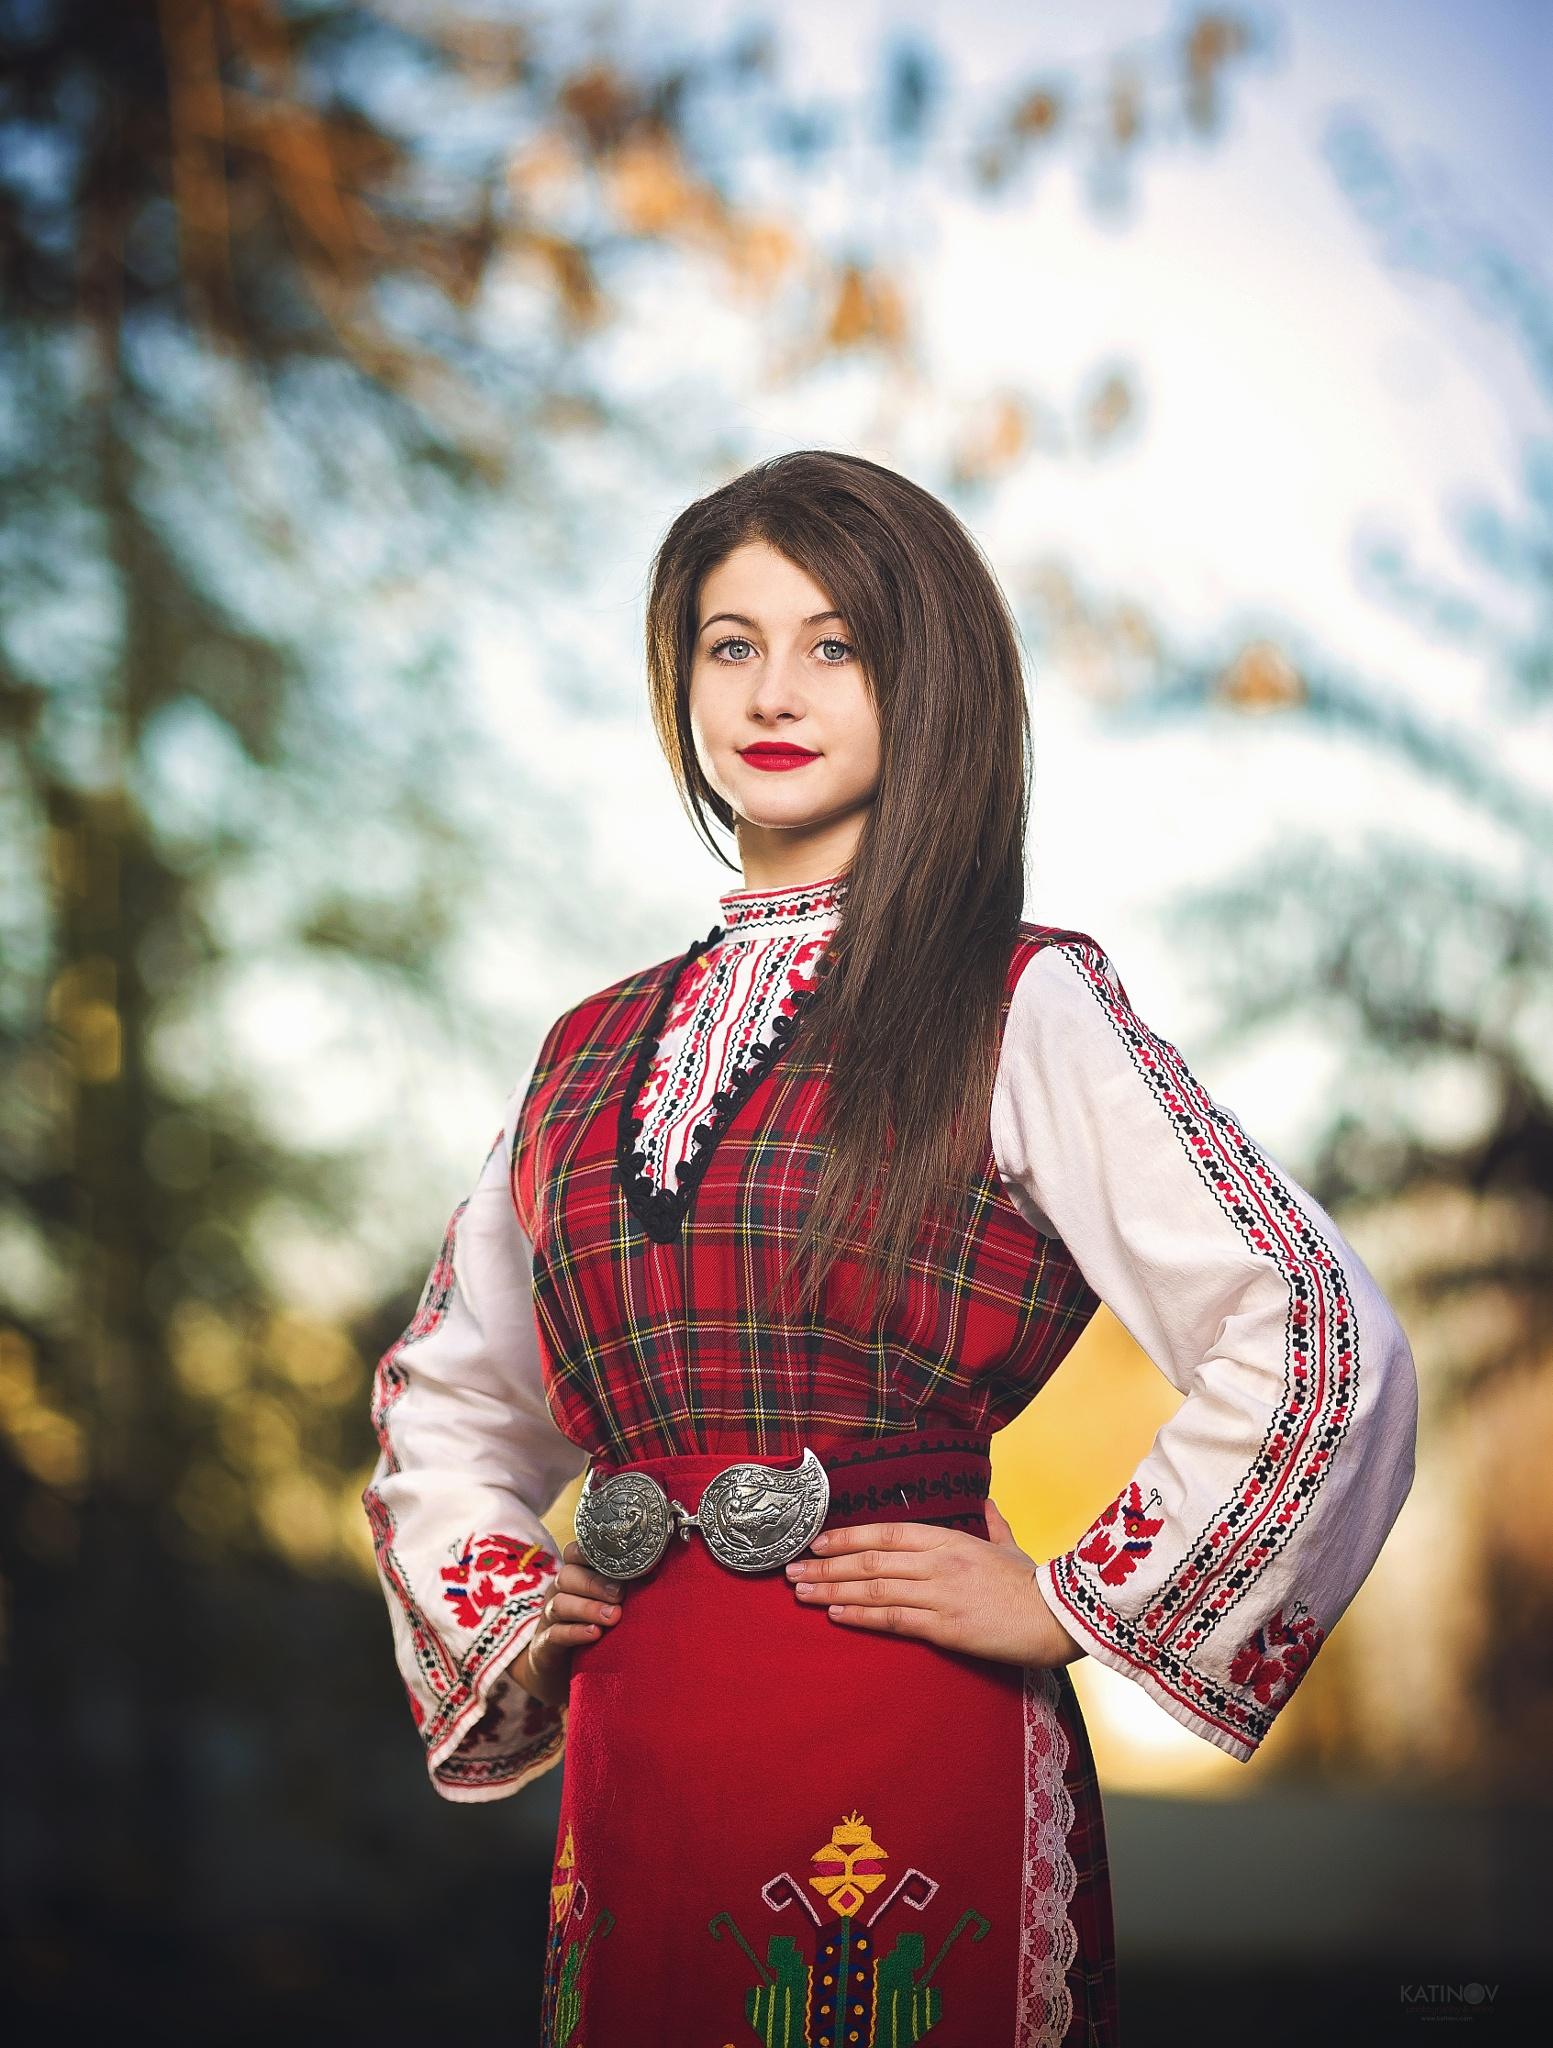 Young Bulgarian folk dancer ! by Stoyan Katinov